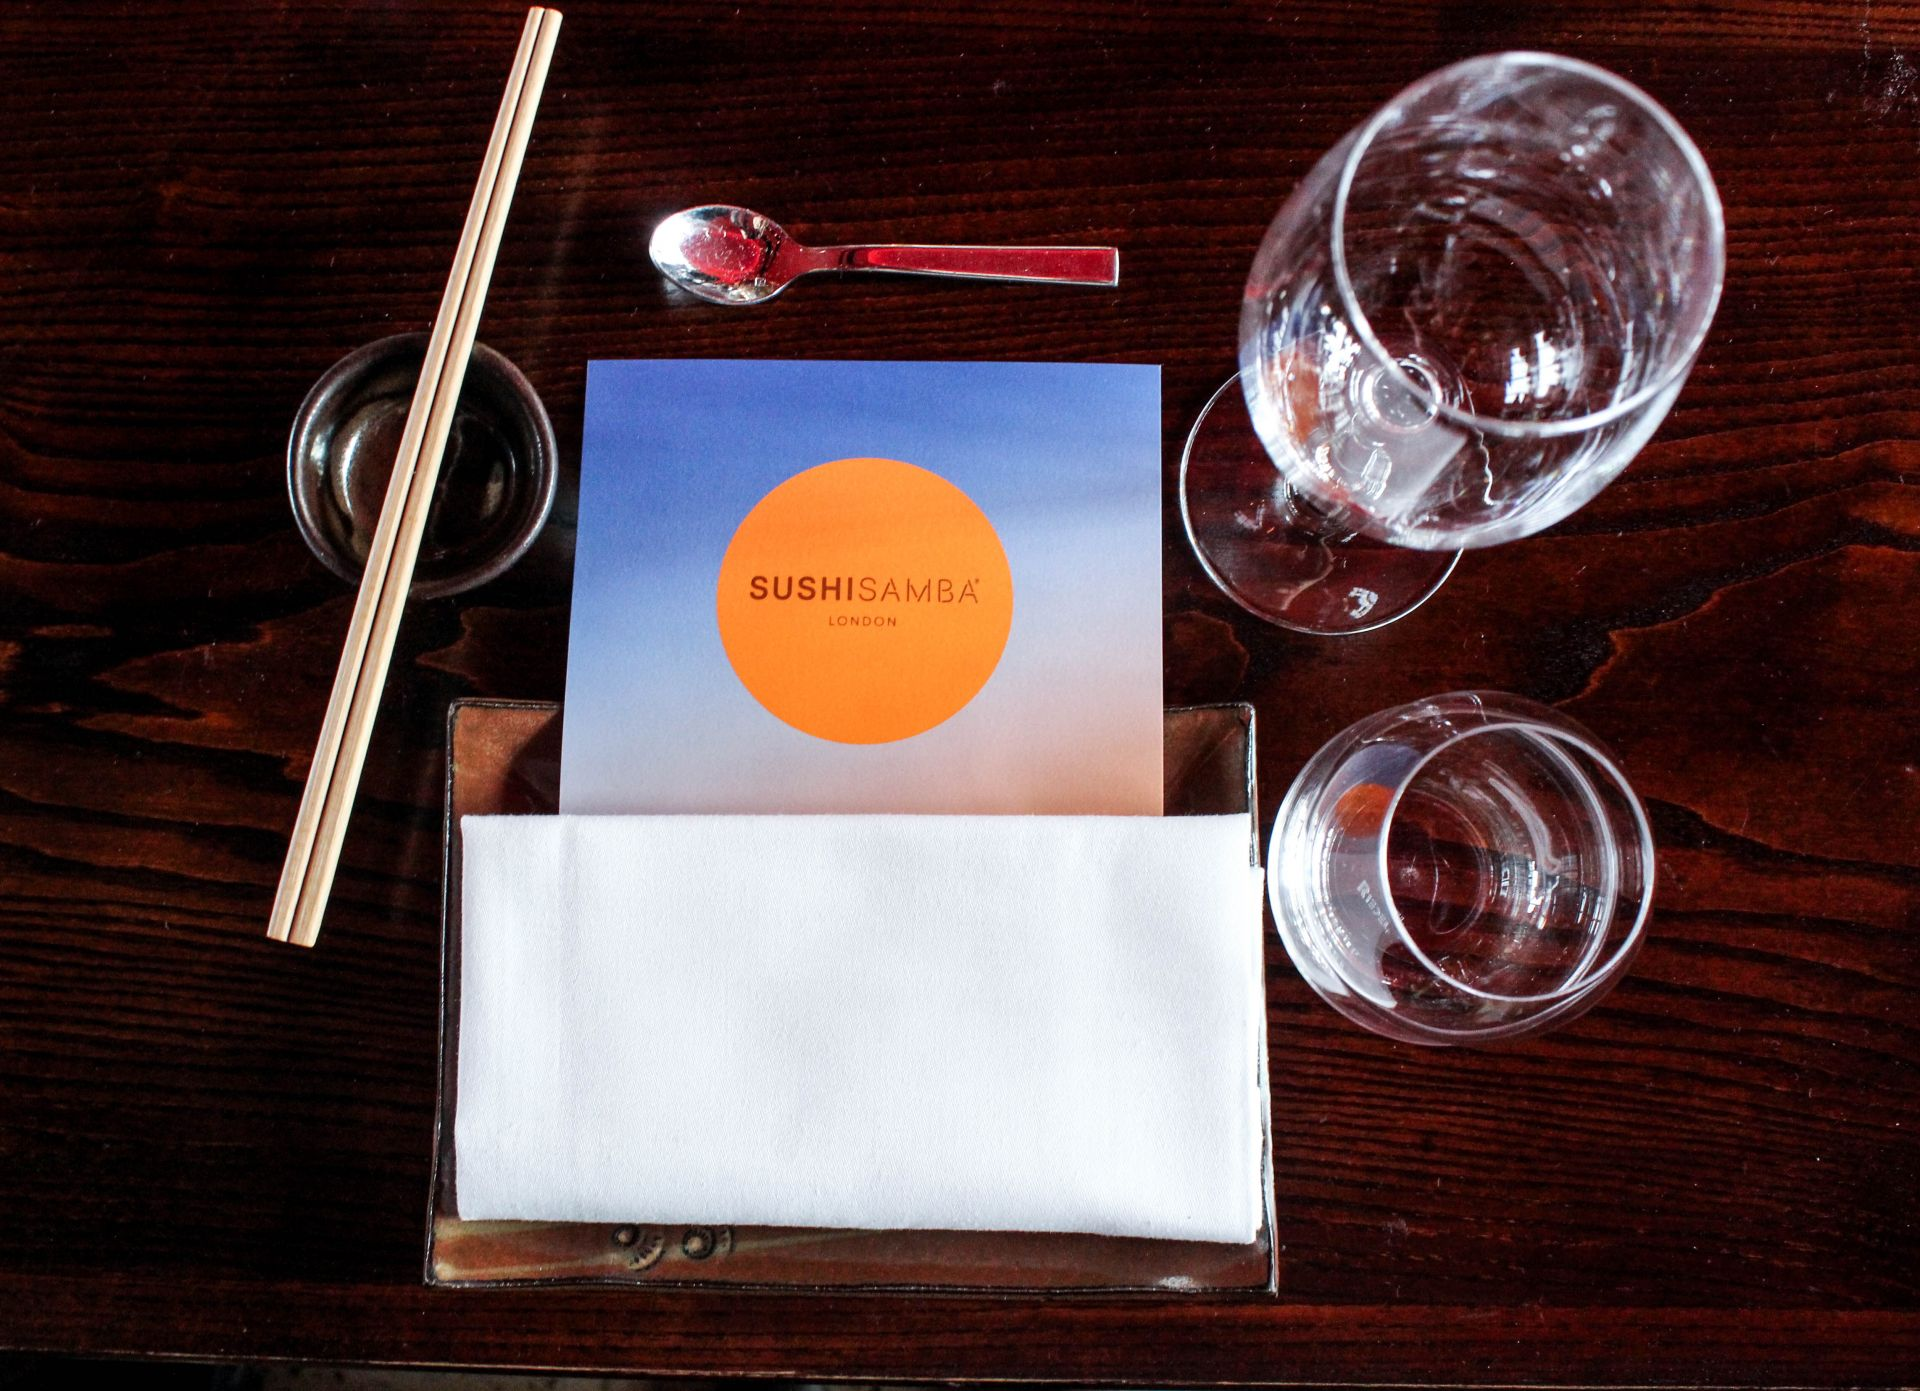 kikkoman soy sauce review, sushisamba